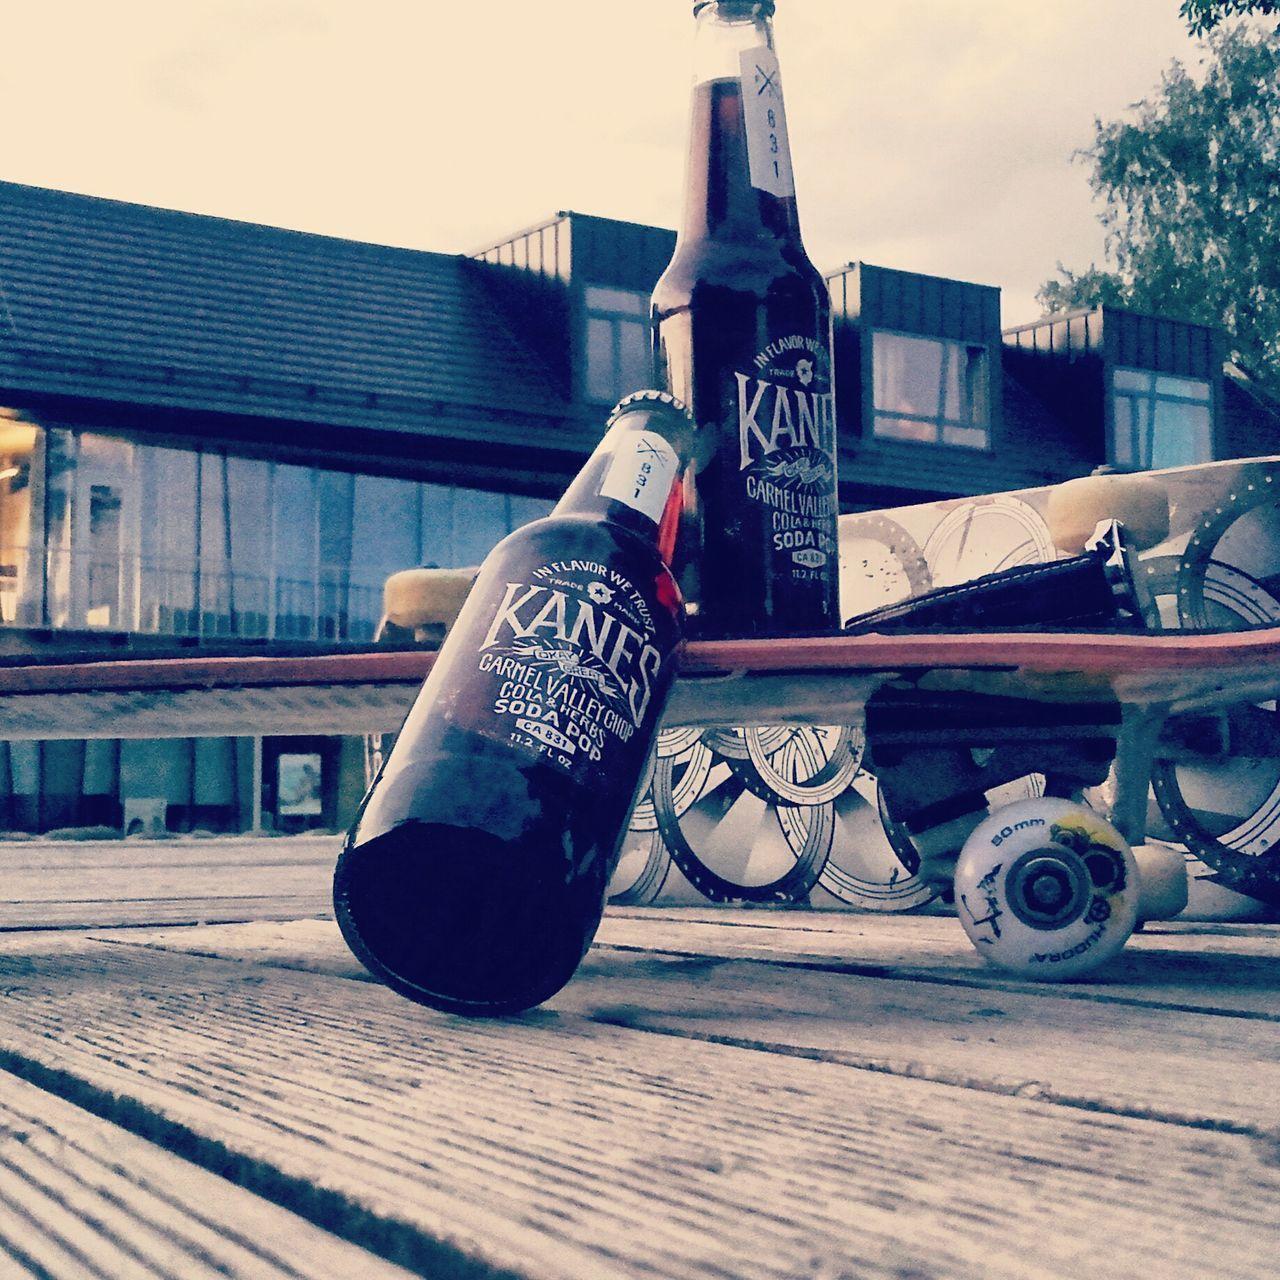 kanes Skateboard Estonia Eavening Sodapop Hudora